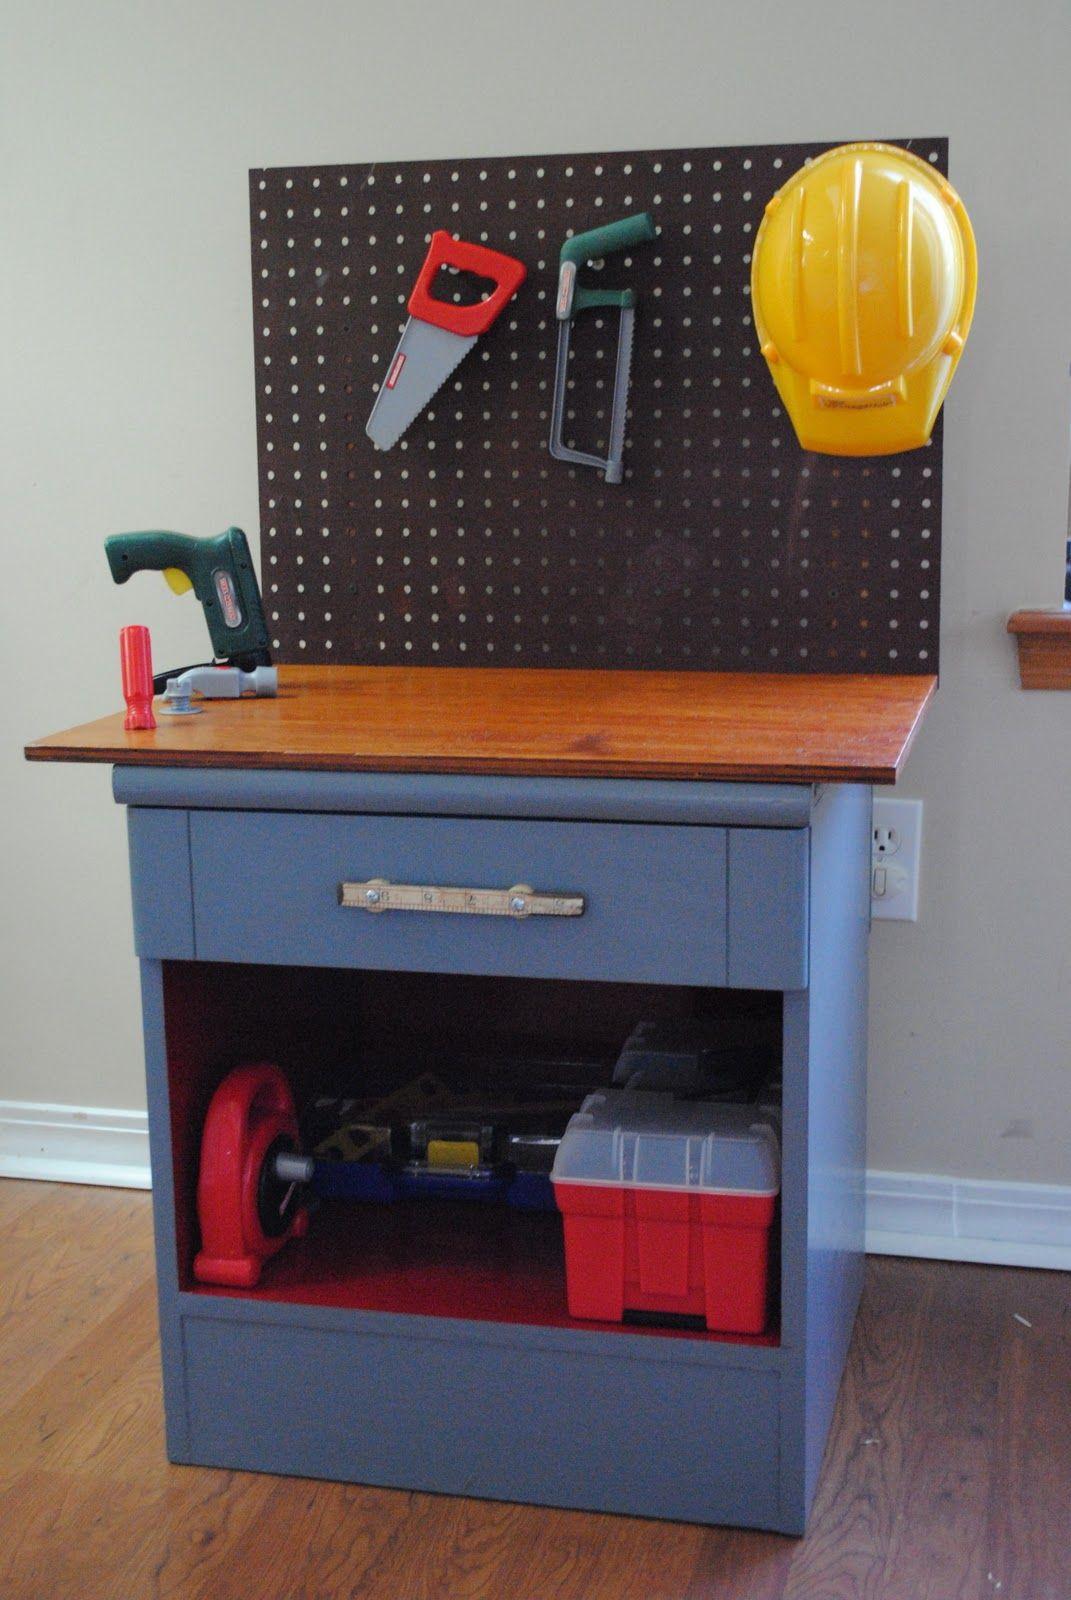 Nightstand Repurposed It S Now A Kids Workbench Design Dazzle